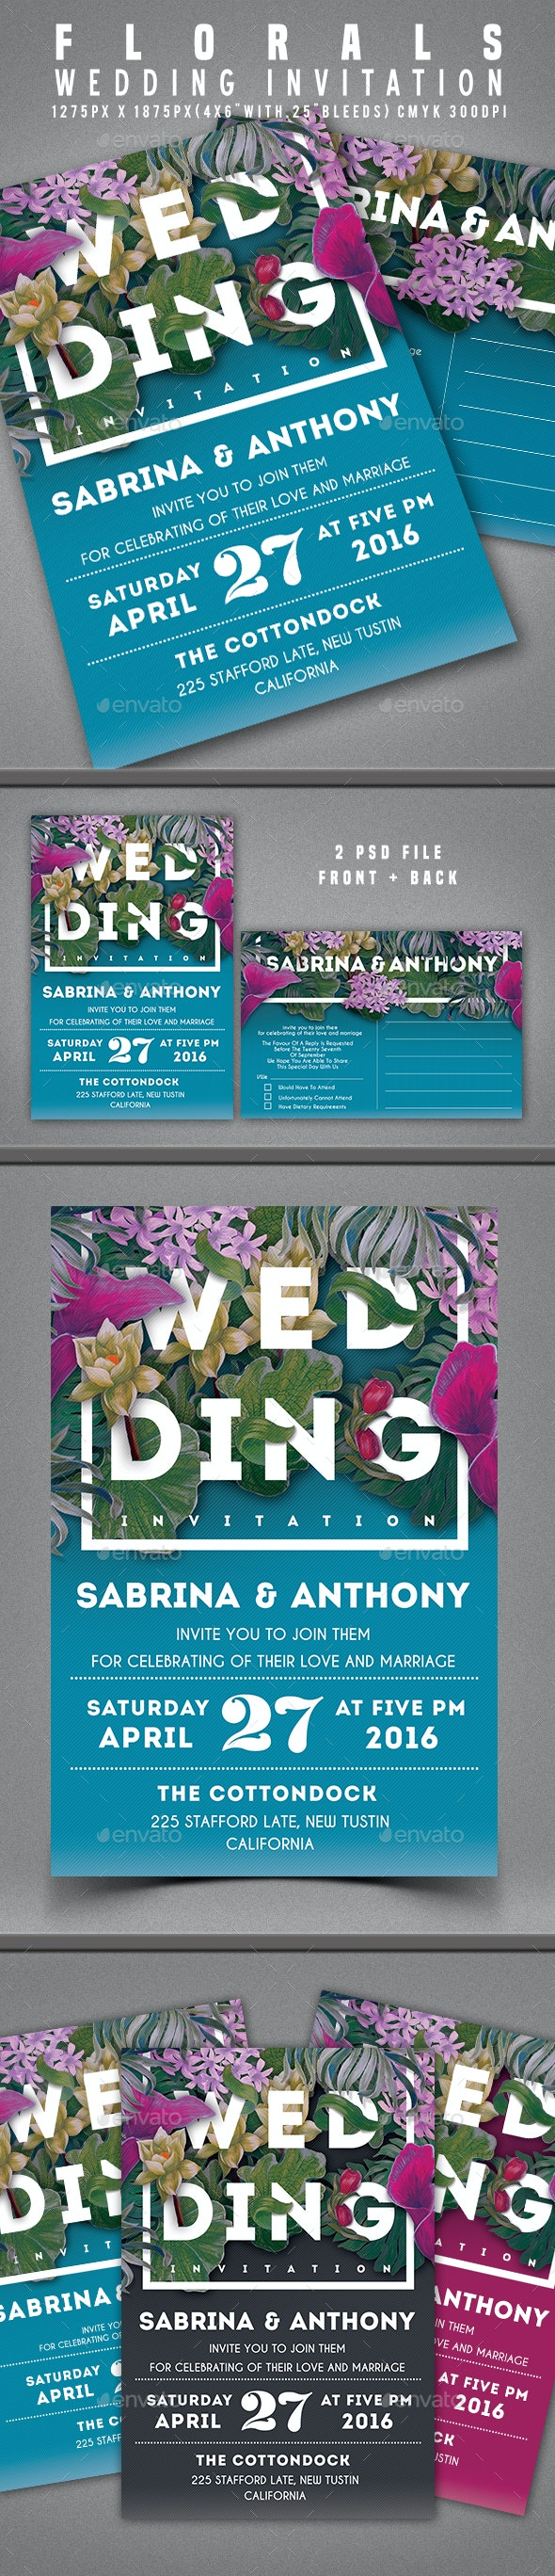 Floral Wedding Invitation - Invitations Cards & Invites